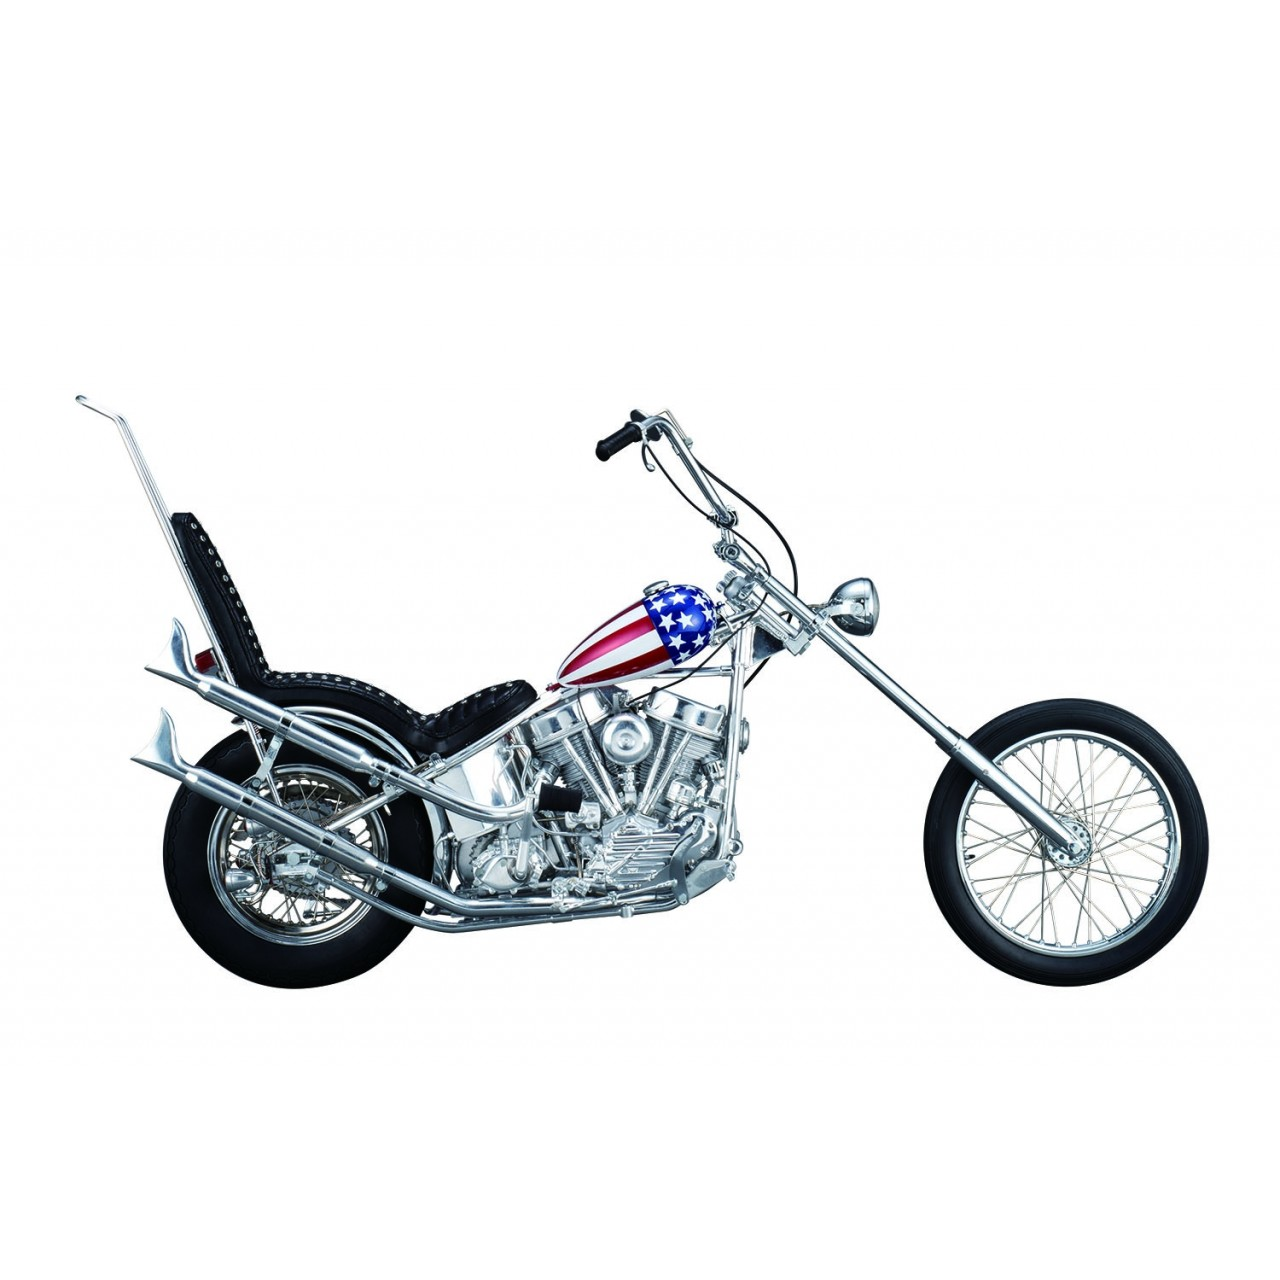 captain america motorrad 1 4 modell modelspace. Black Bedroom Furniture Sets. Home Design Ideas